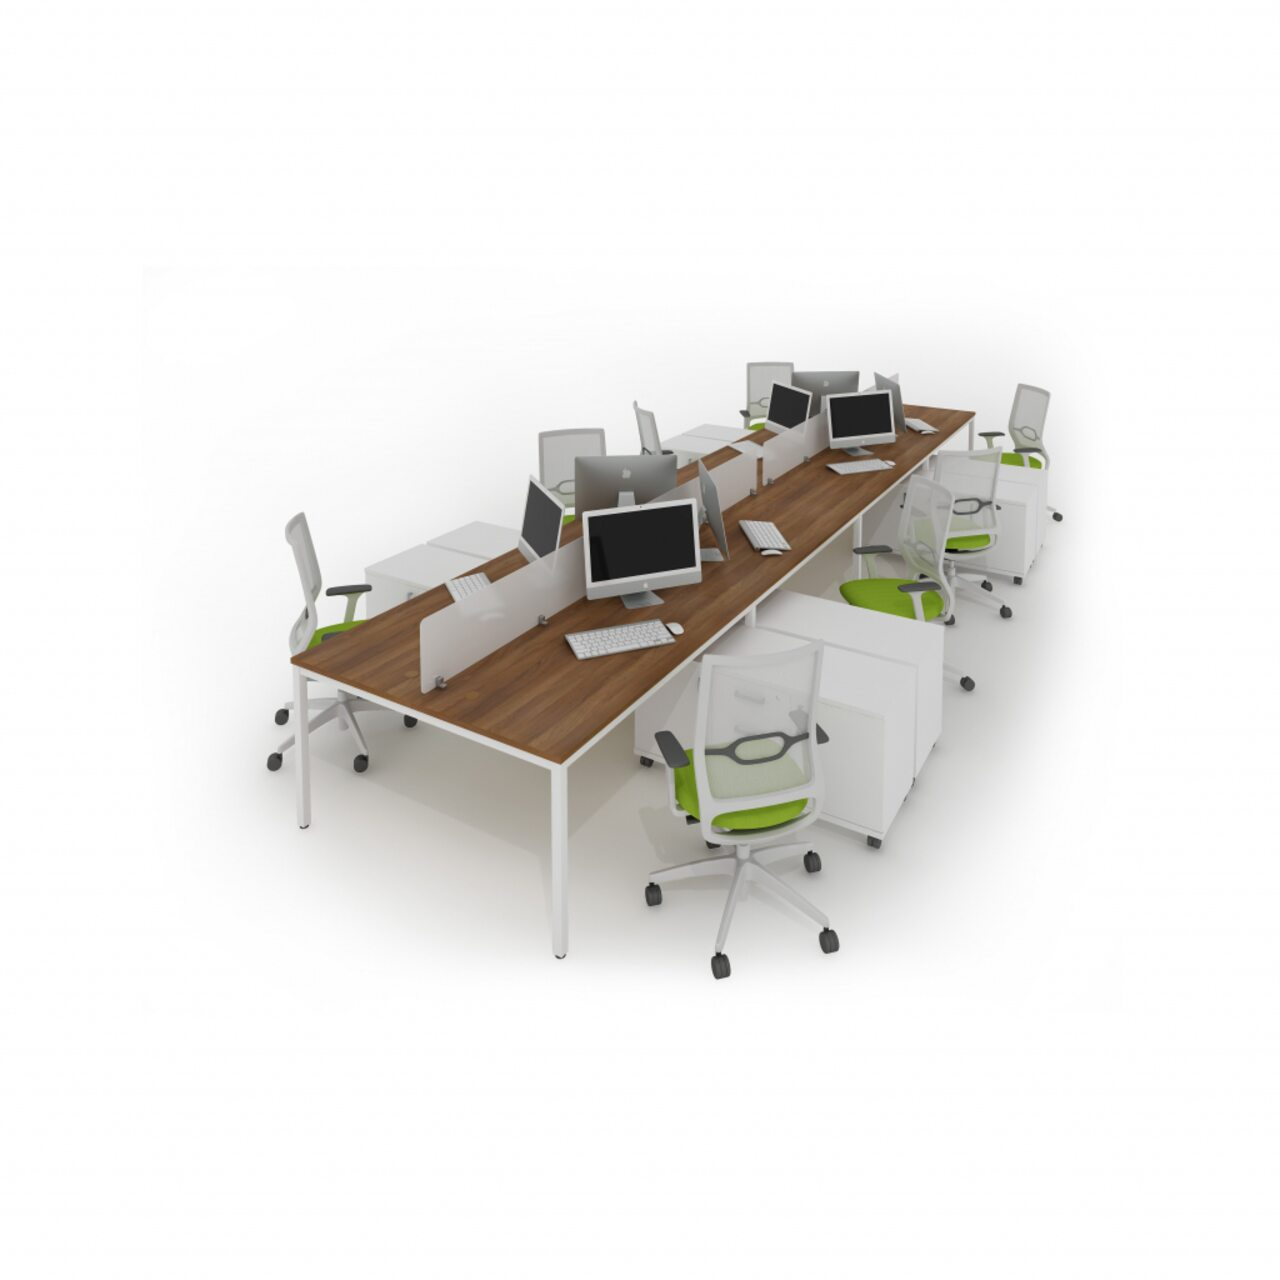 Мебель для персонала Avance - фото 10